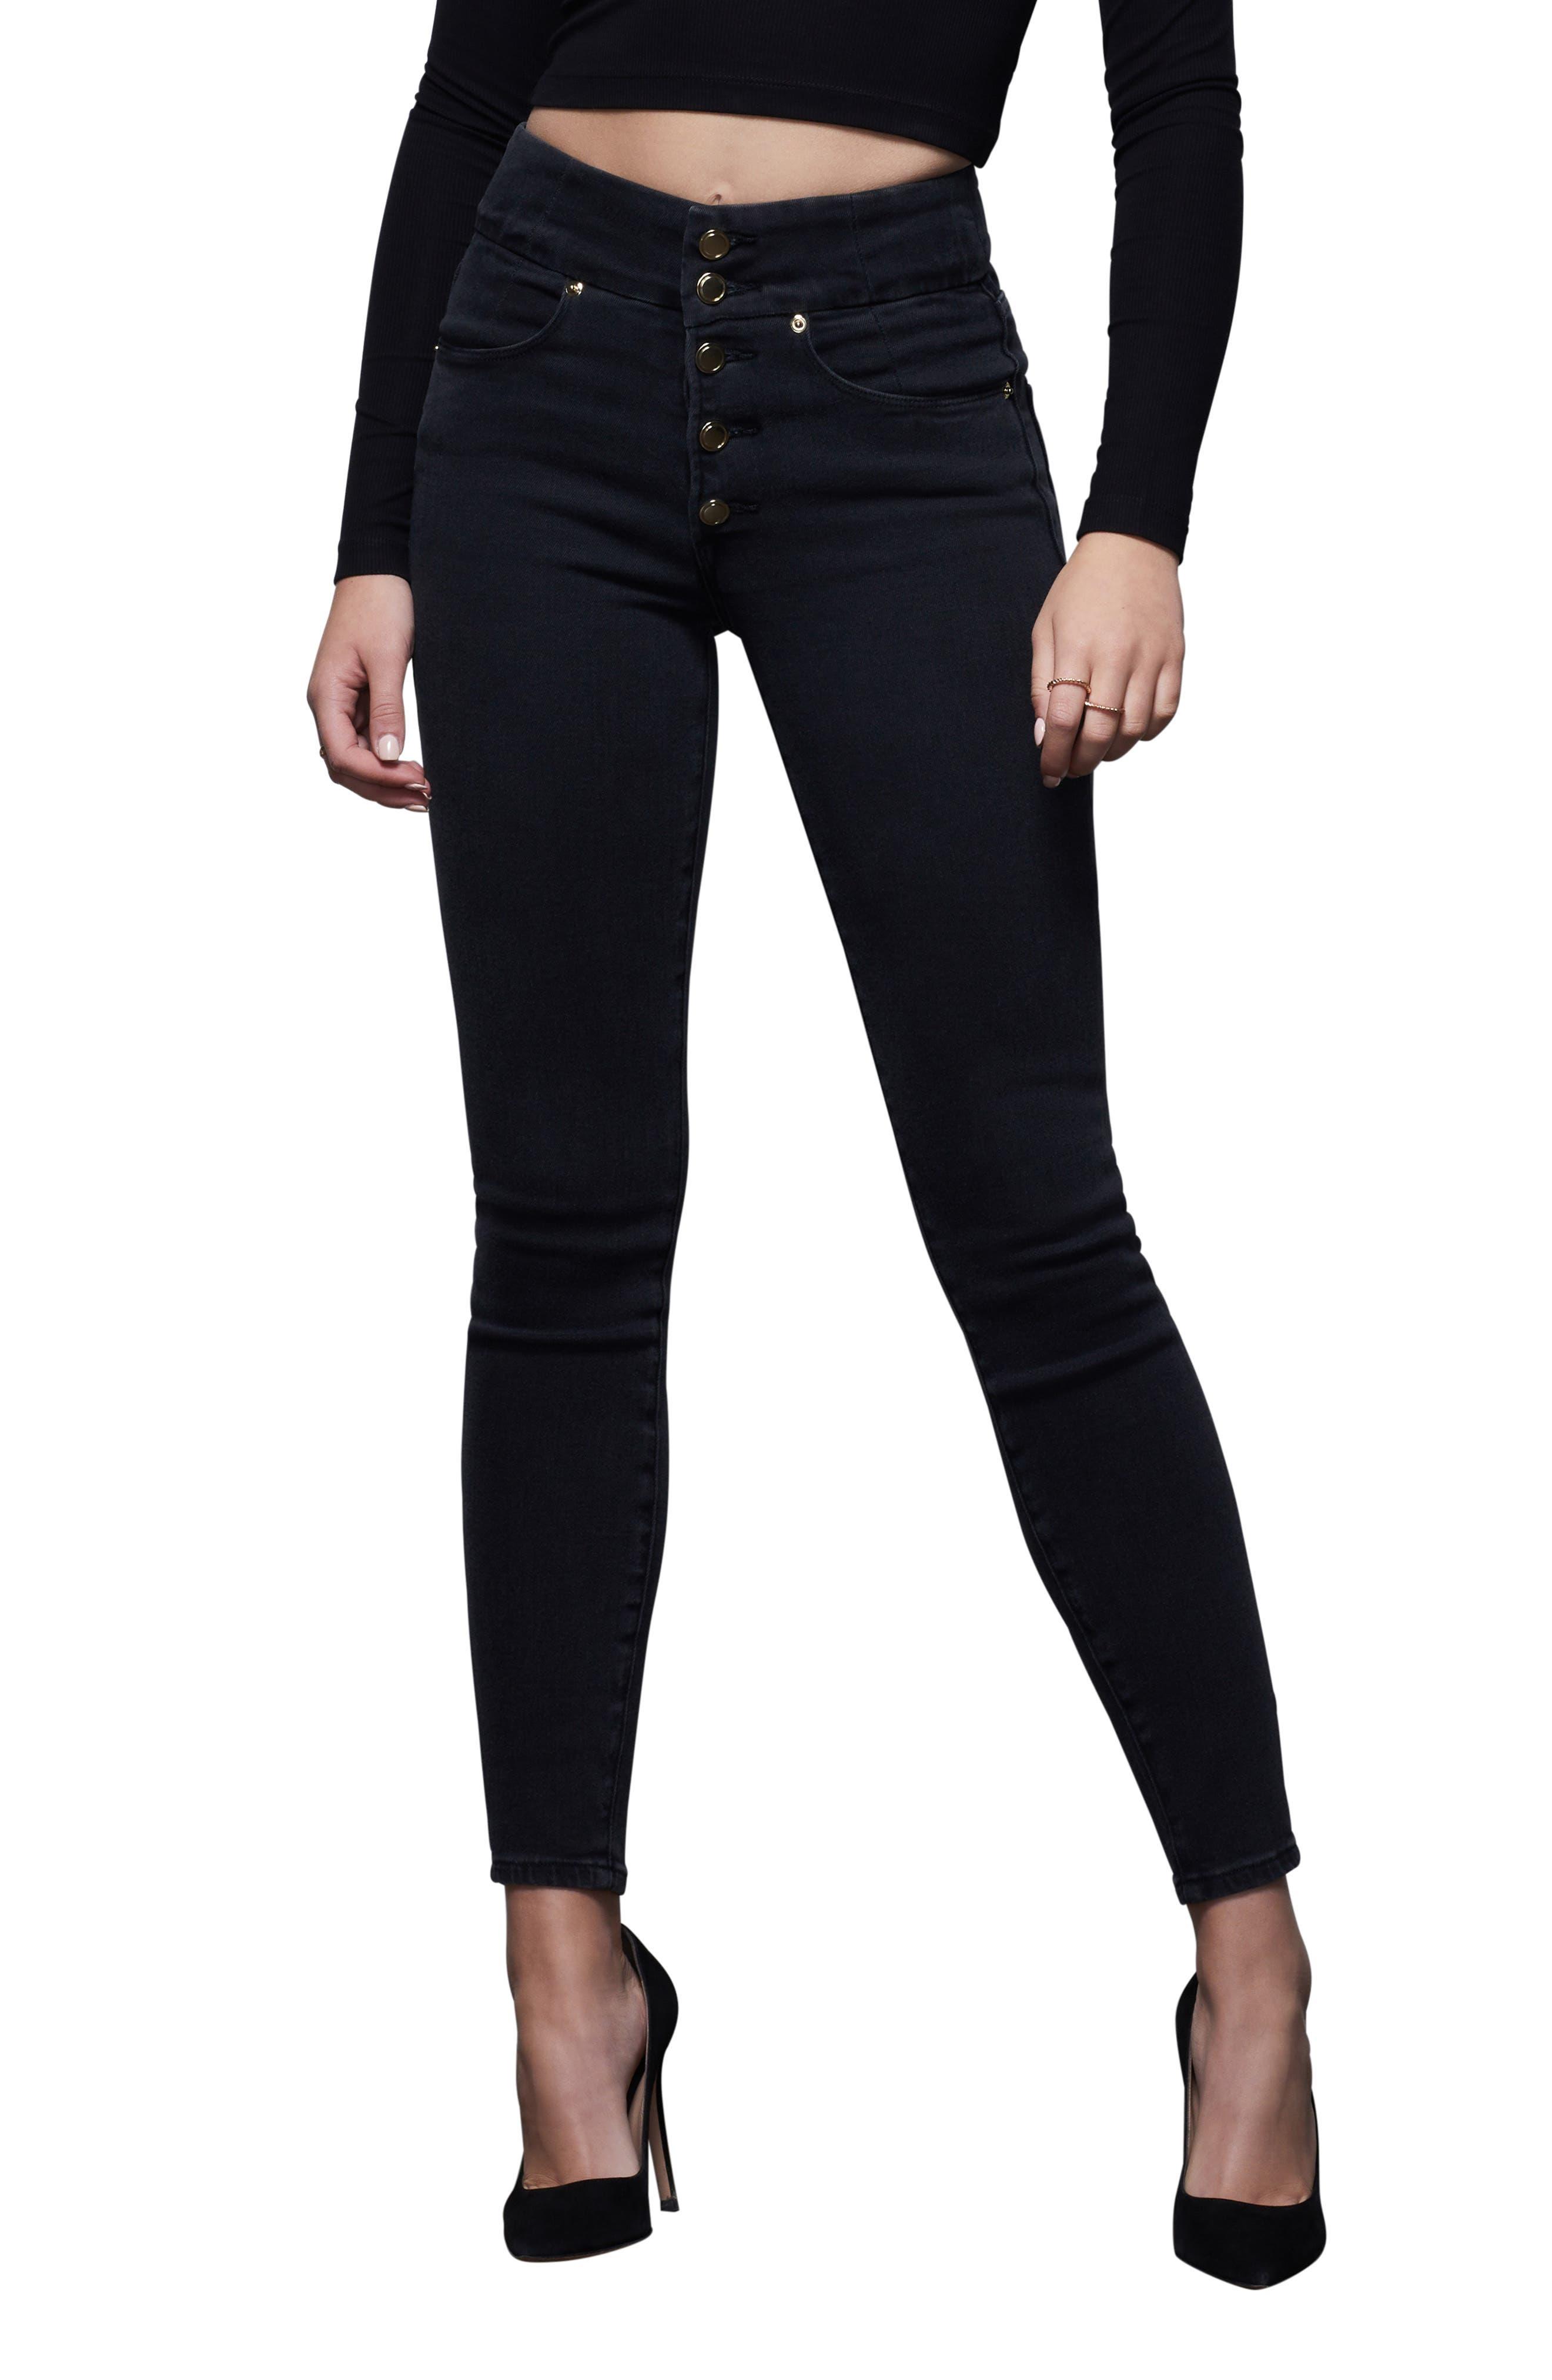 Plus Women's Good American Good Waist High Waist Button Fly Skinny Jeans